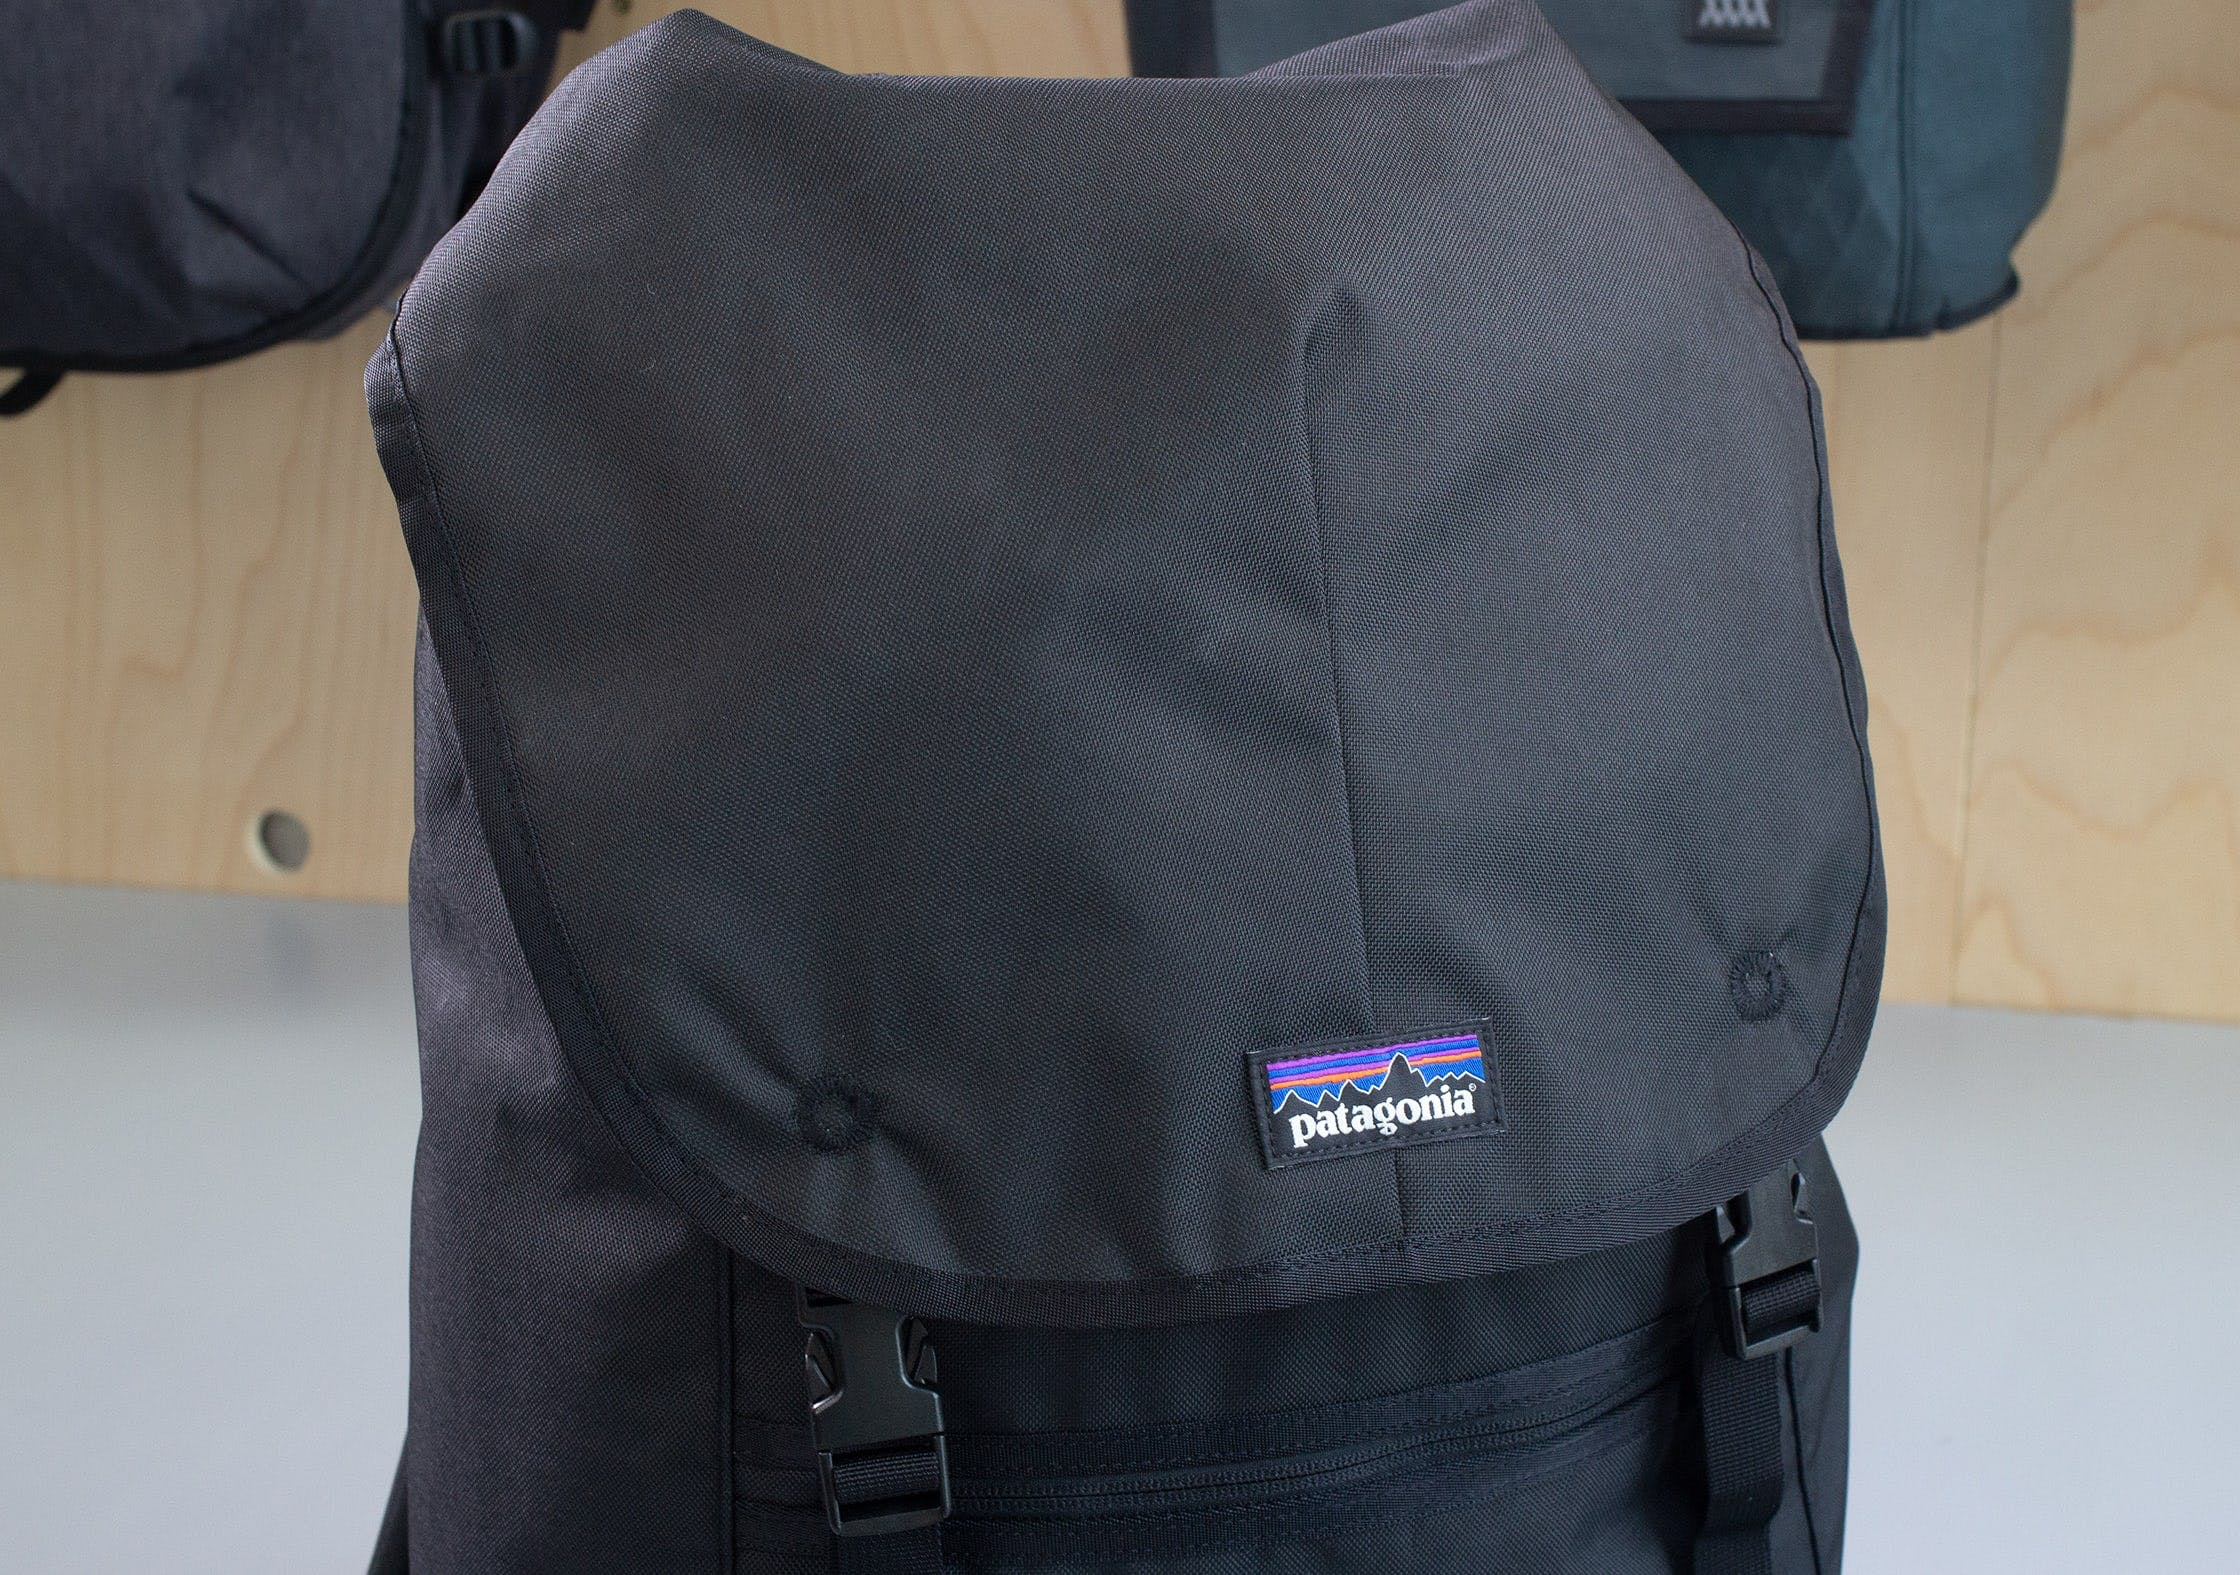 Patagonia Arbor Classic Pack Branding